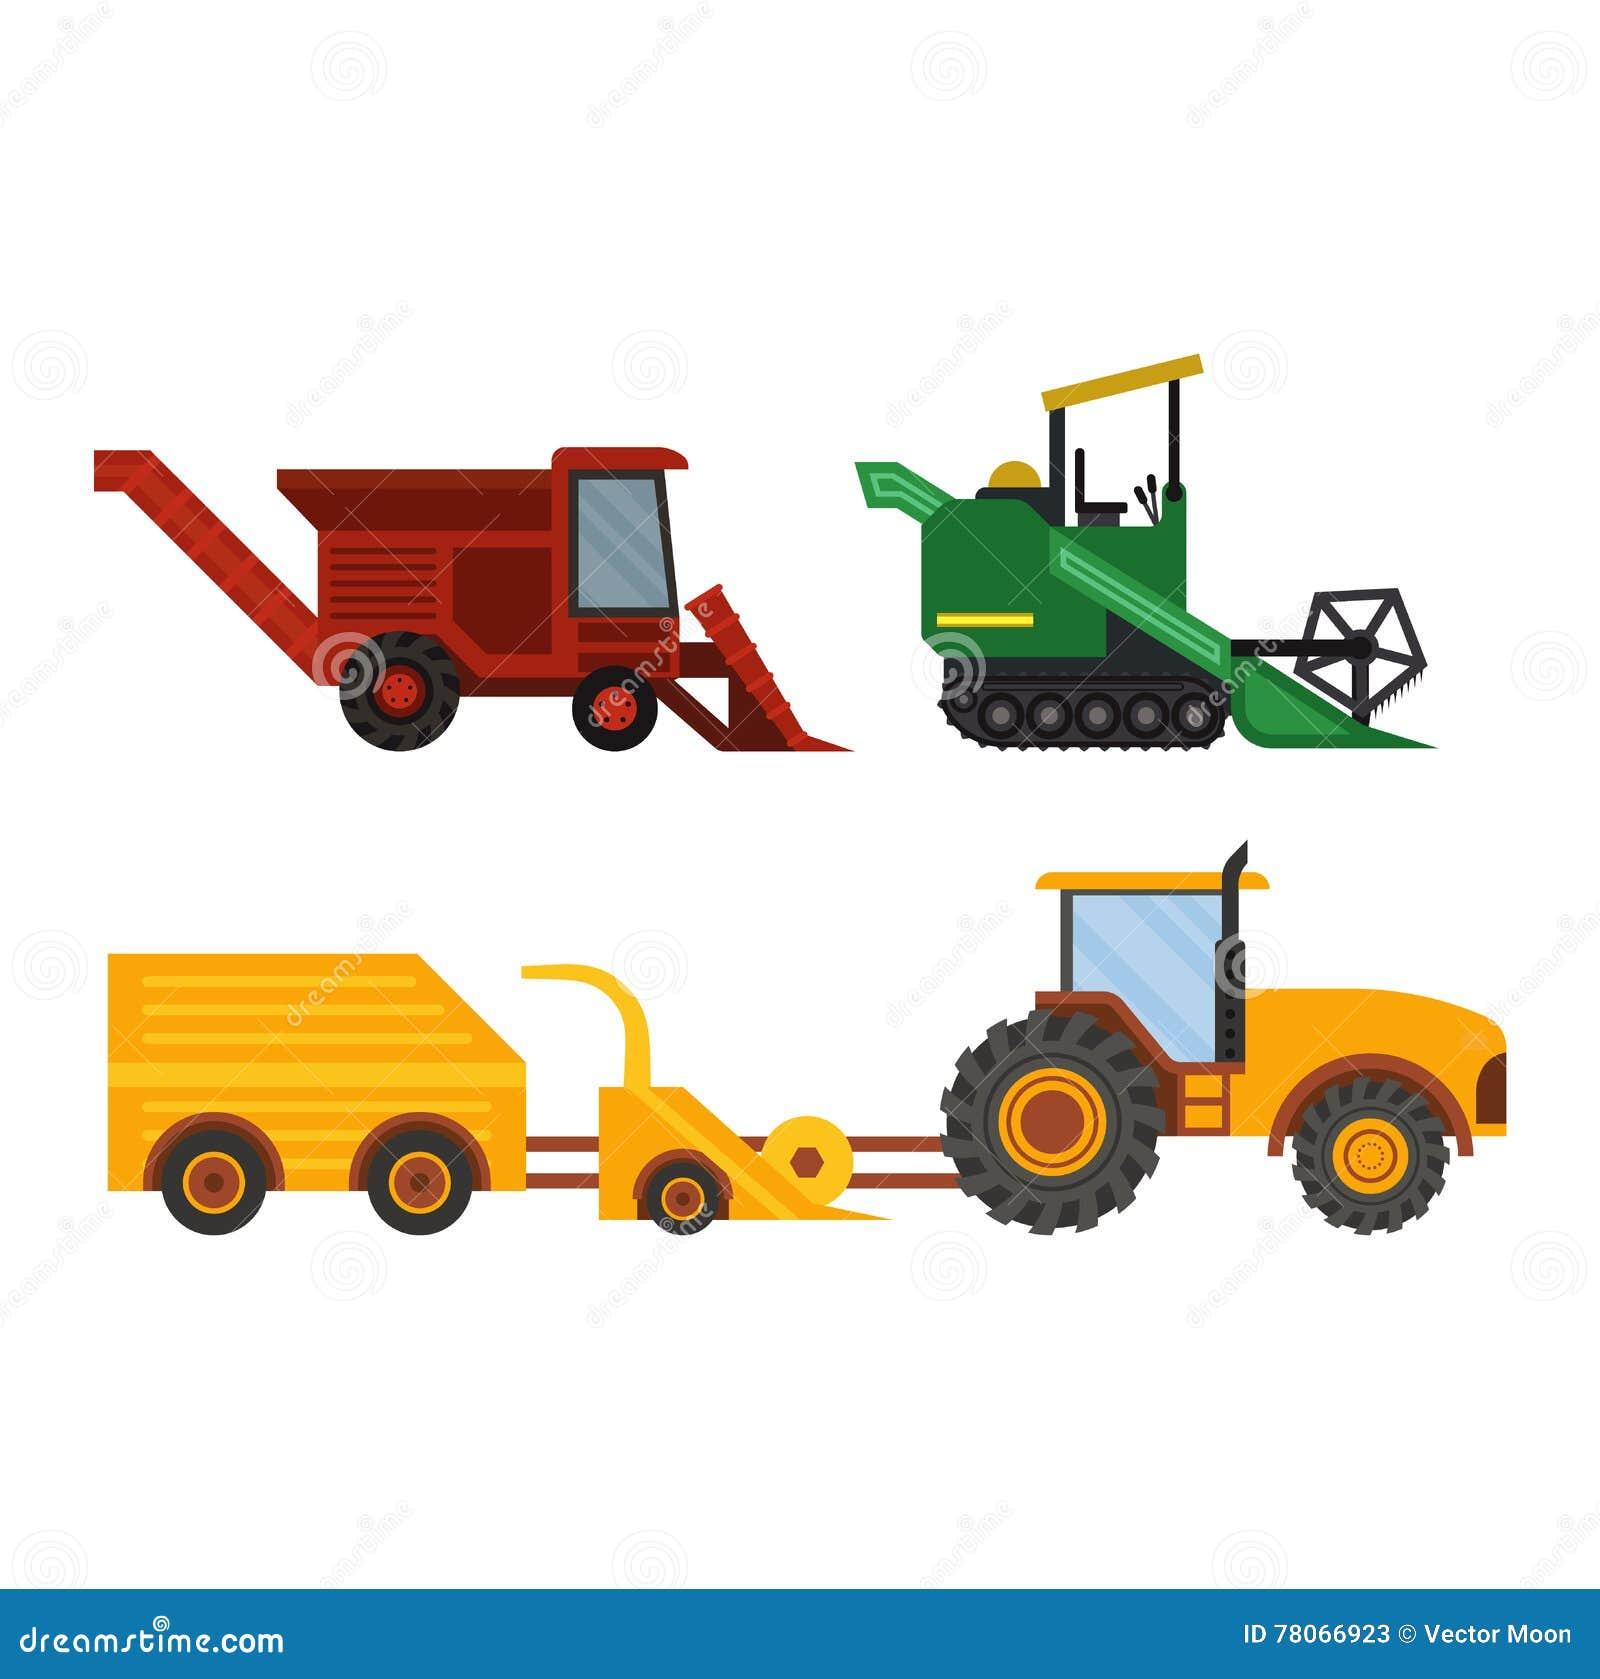 Tractor Cartoon Picker : Excavators cartoons illustrations vector stock images